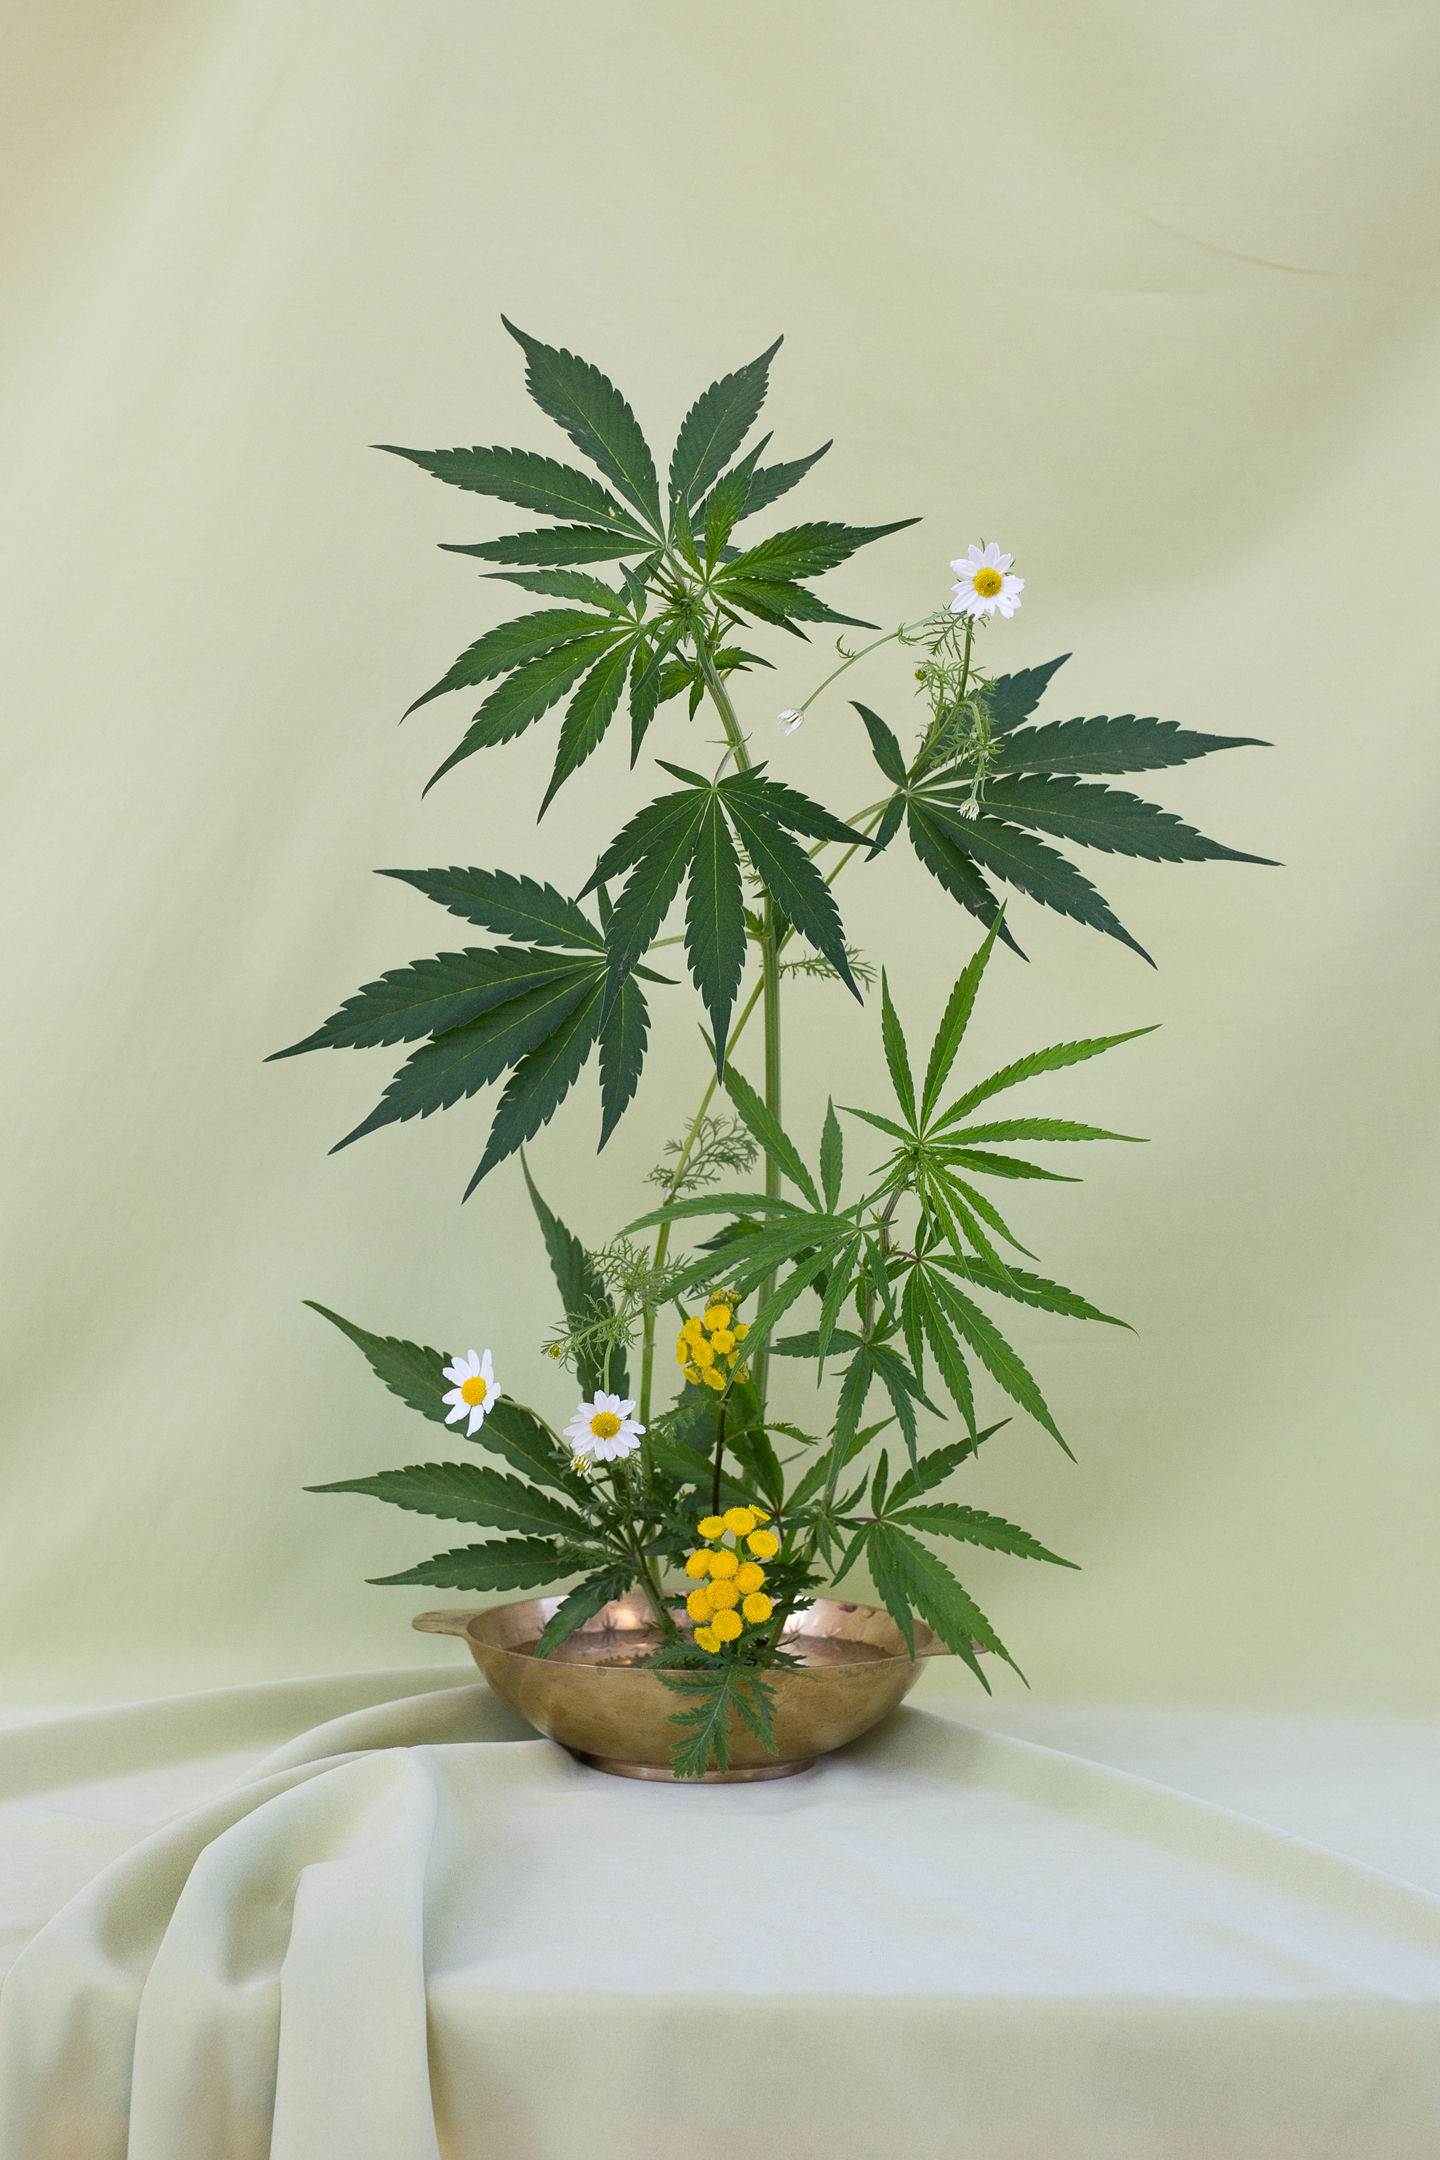 Broccoli_SeekingArrangement_01_PhotobyAnjaCharbonneau_FloralDesignByAmyMerrick.jpg